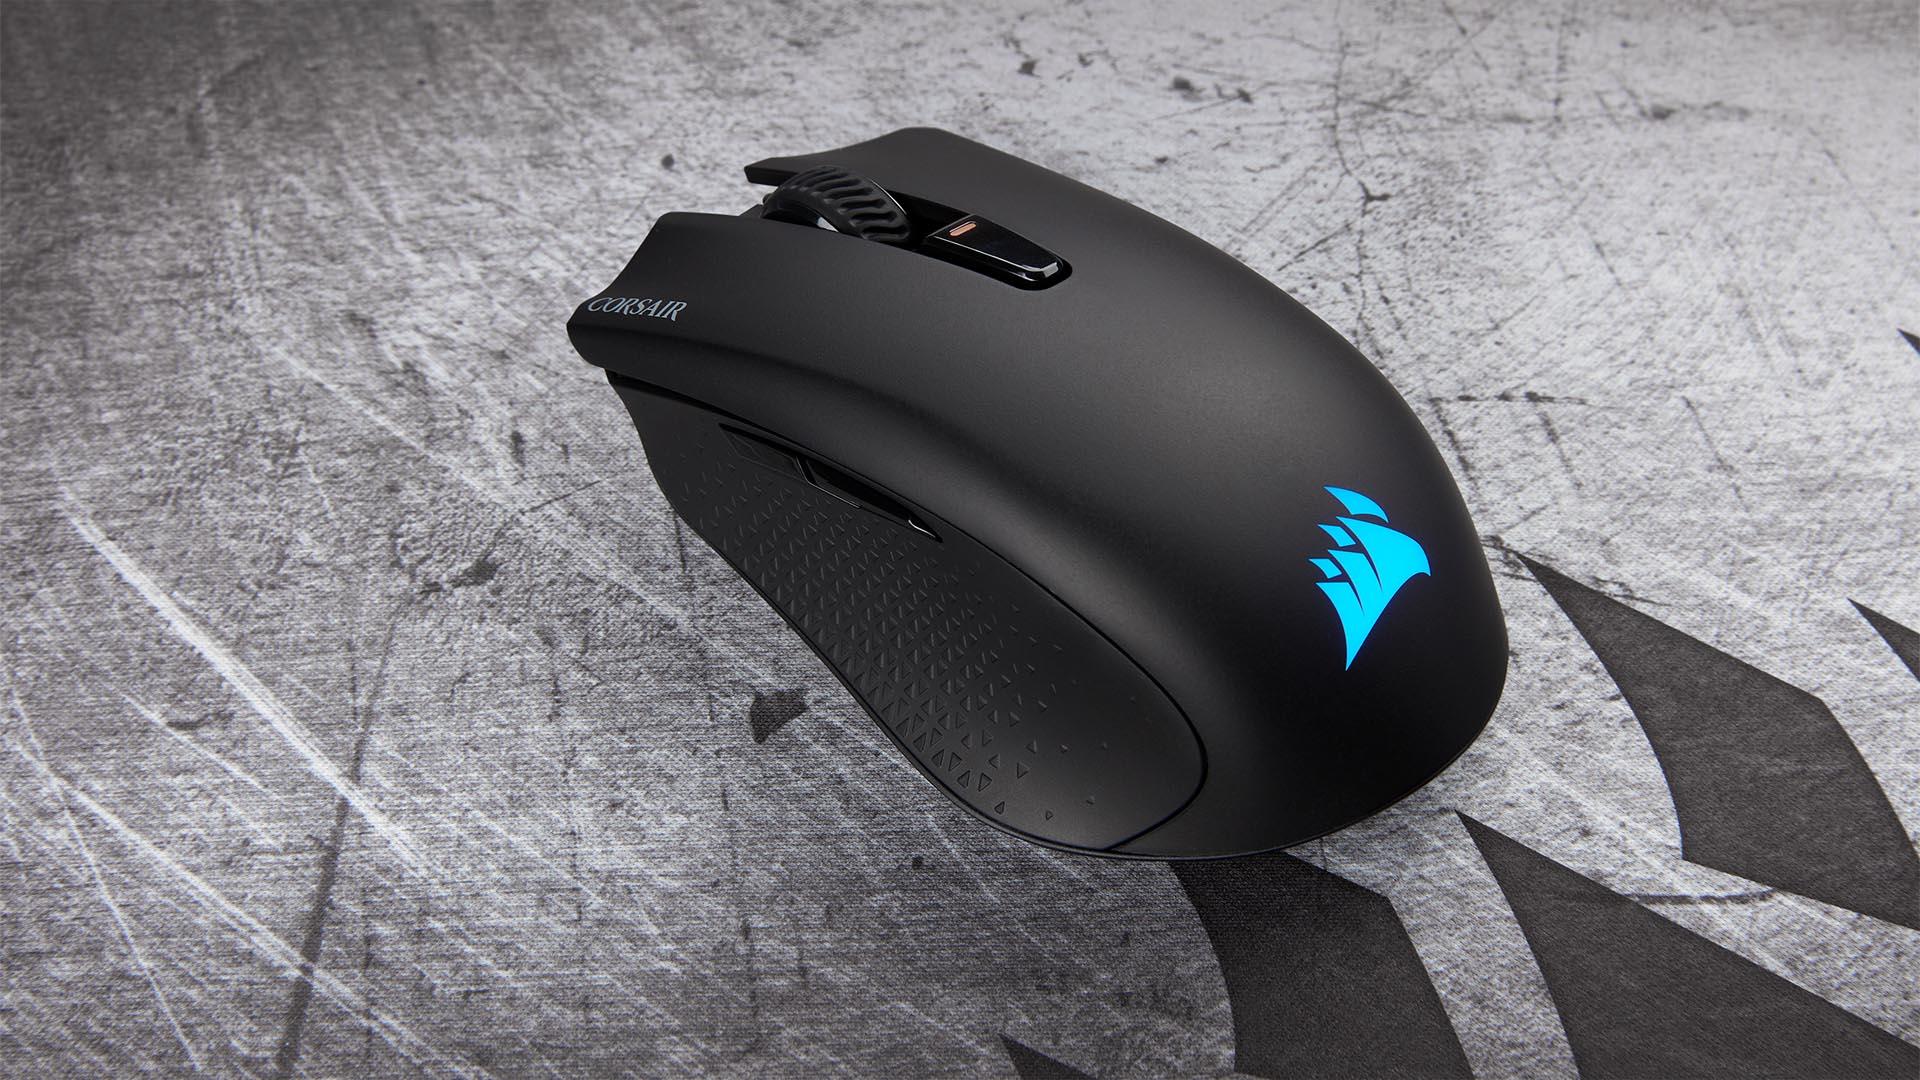 Corsair Harpoon RGB Wireless: miglior mouse gaming wireless economico